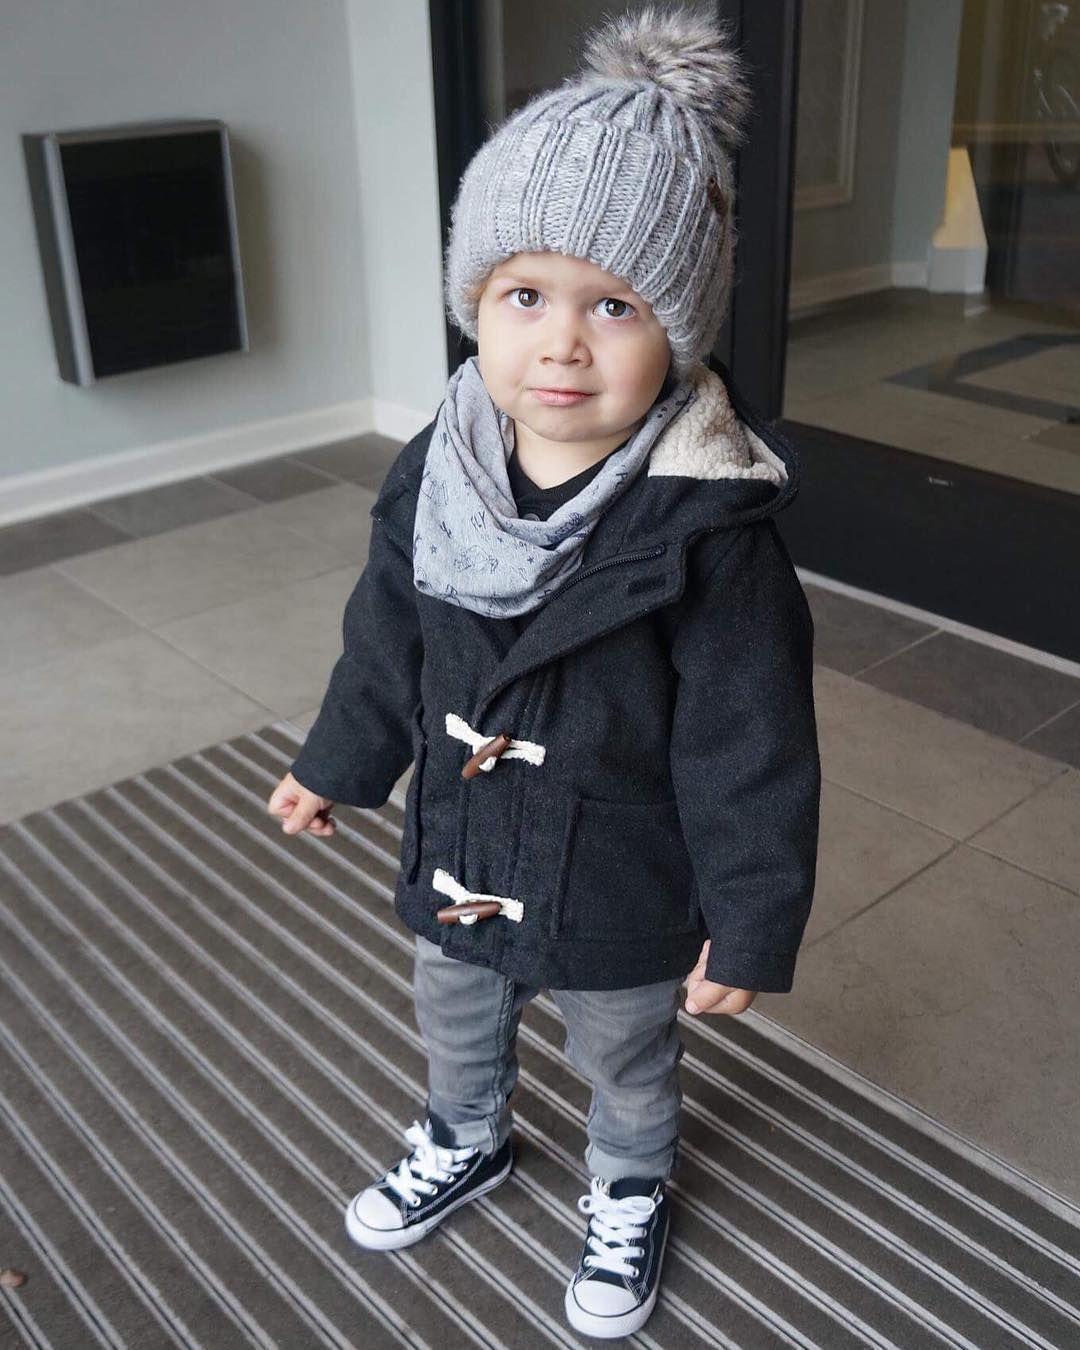 Ad 1 Notitle Babyboyfashiondressy Babyboyfashiongirls Babyboyfashionh Amp M Babyboyfashionsporty B In 2020 Kids Outfits Baby Boy Fashion Kids Fashion Baby